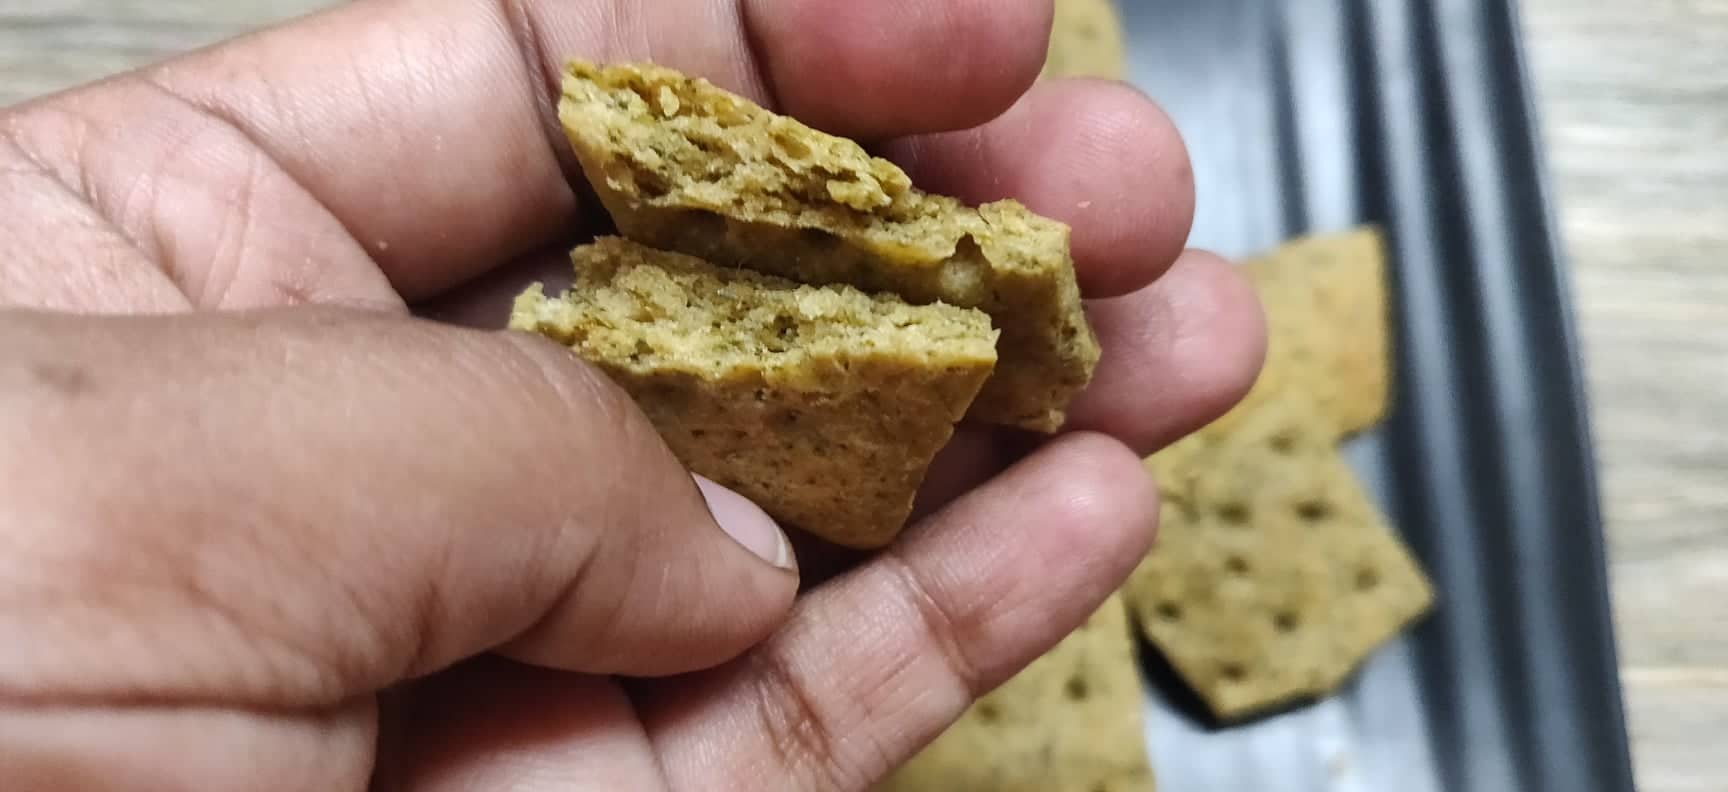 curry_leaves_crackers - 76751452_958971217792856_852156691603521536_n